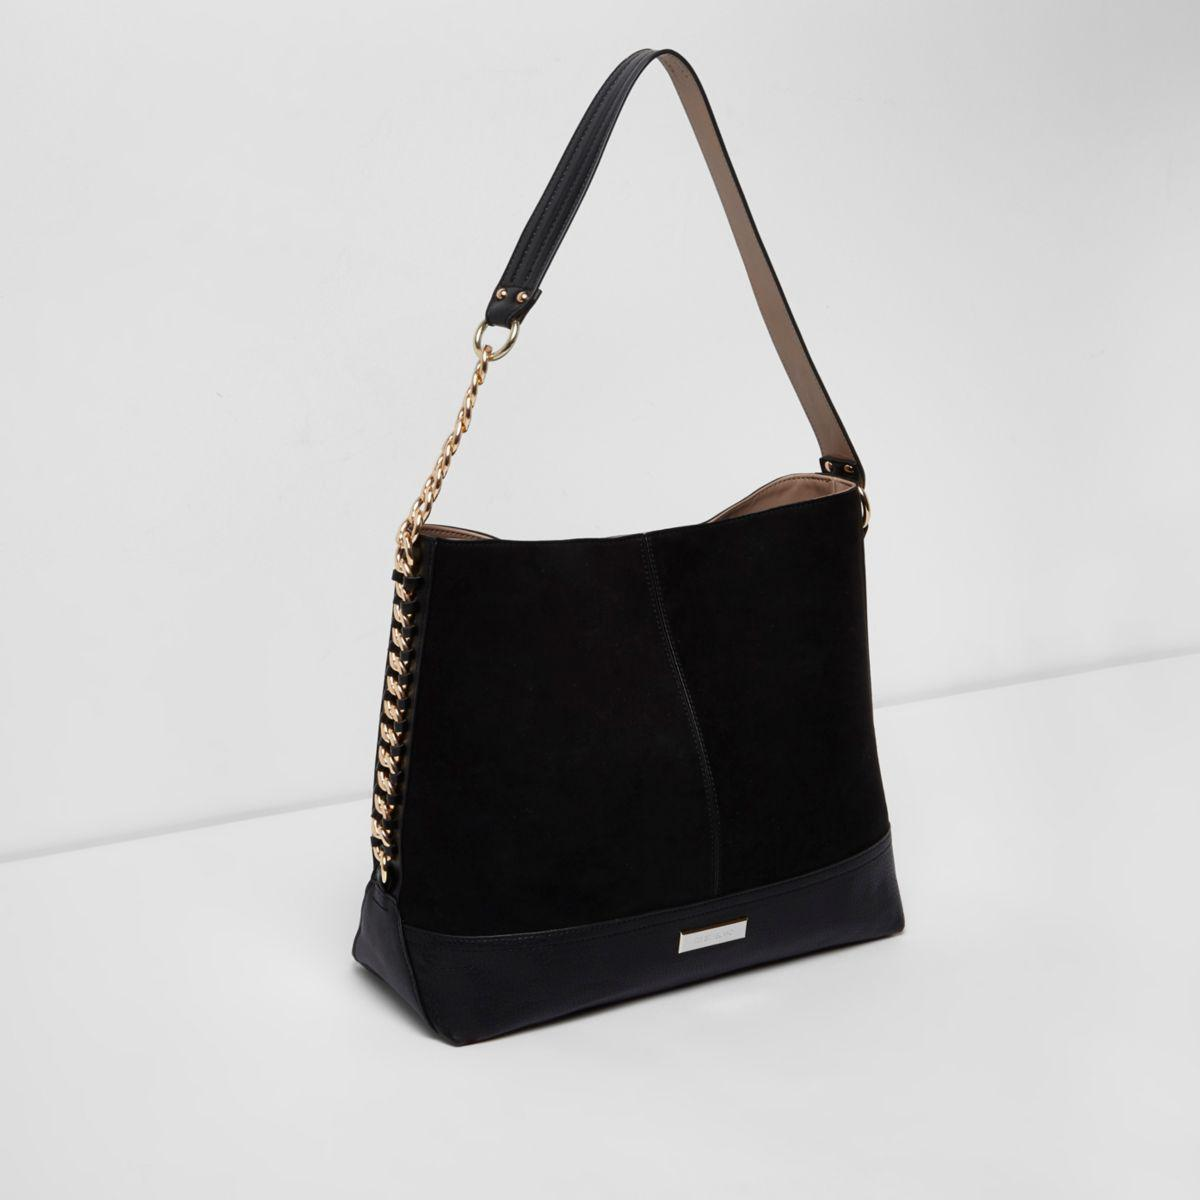 Lyst - River Island Black Chain Side Slouch Bag in Black 1e30355f37b62